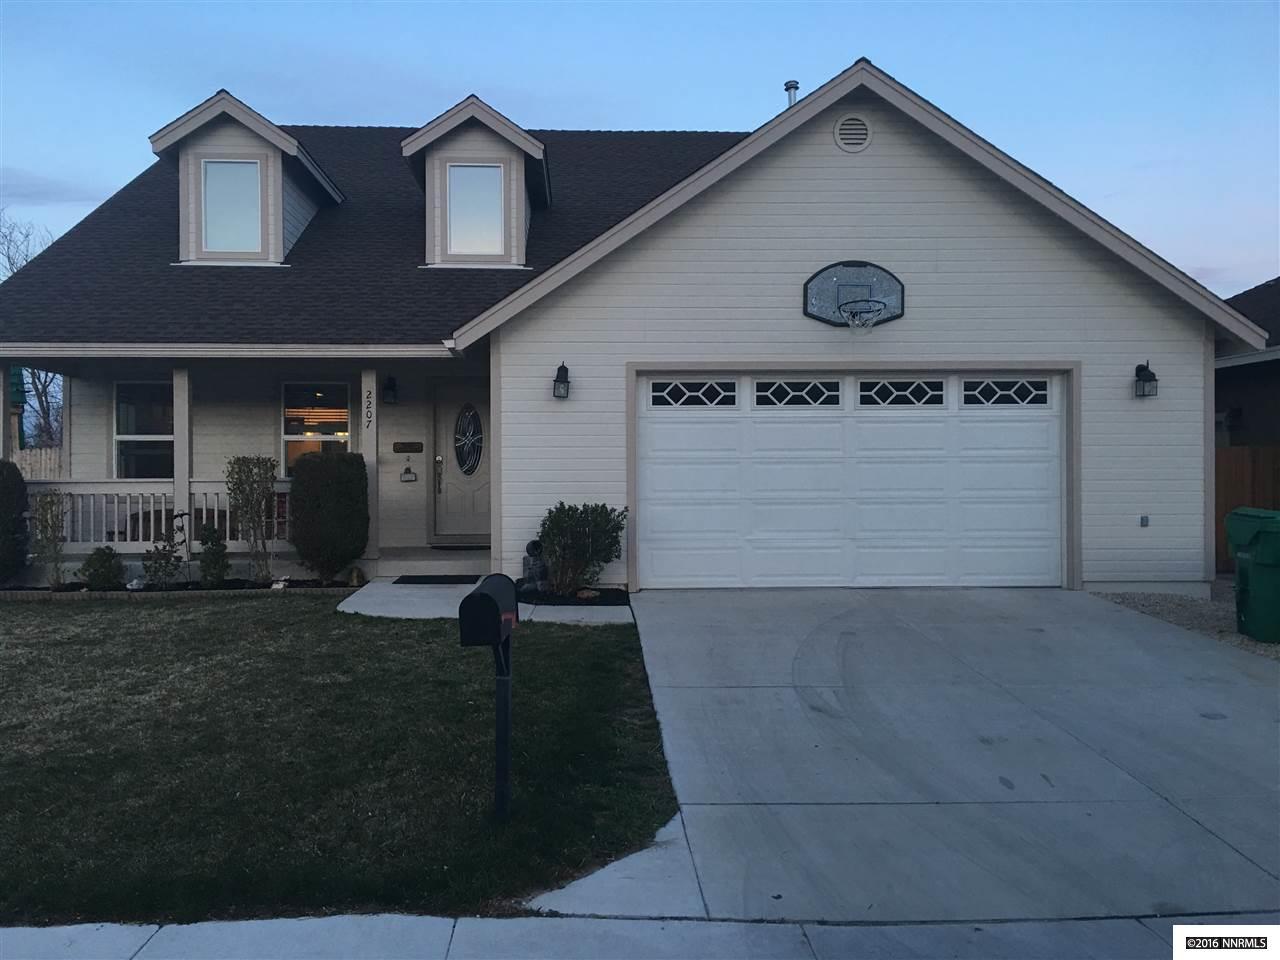 2207 Birch St, Carson City, NV